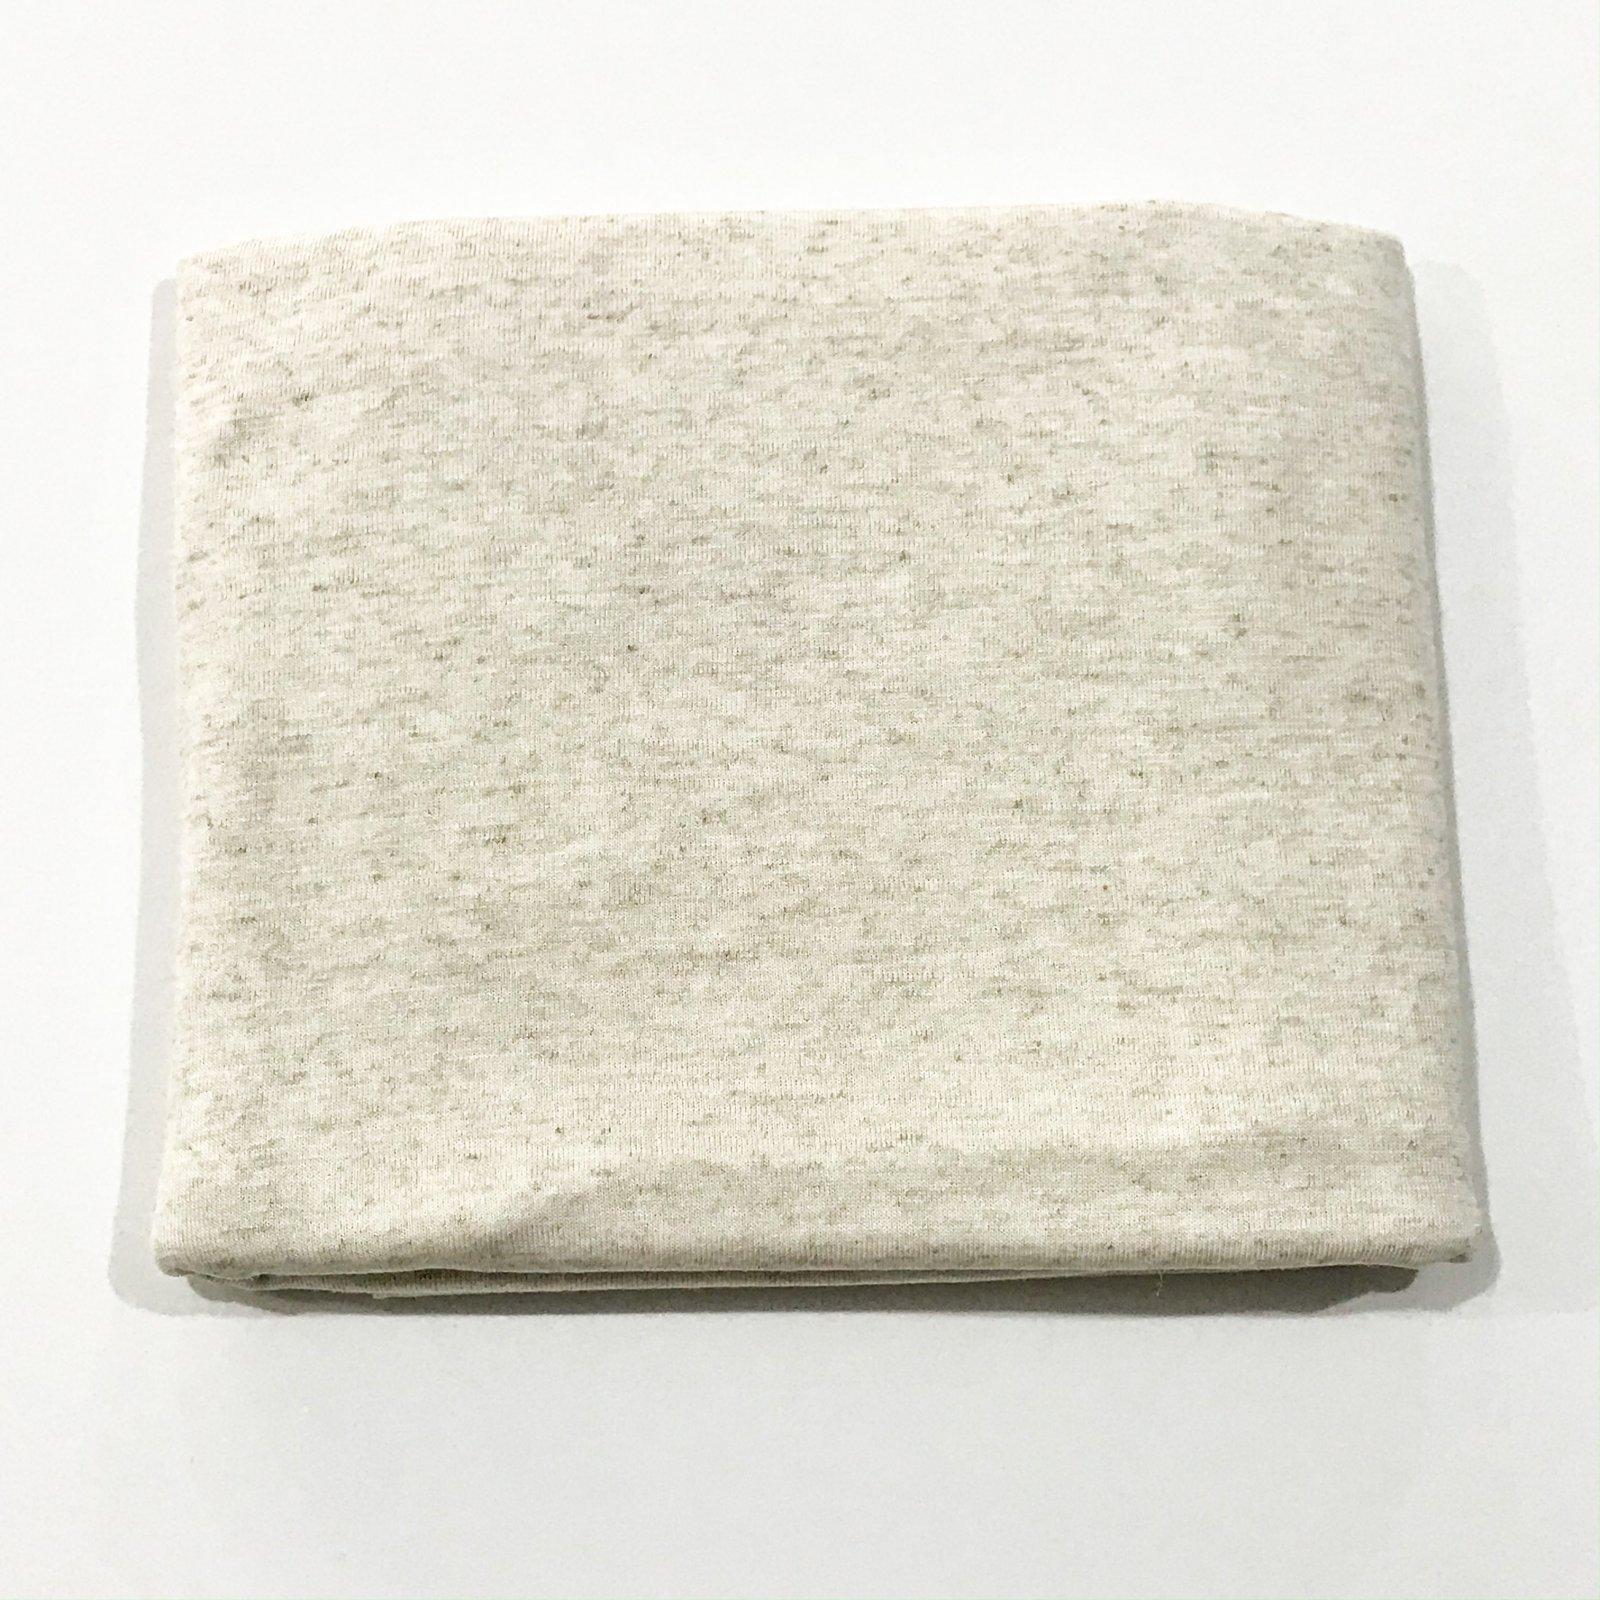 Sweater Knit - Oatmeal - 2 yards